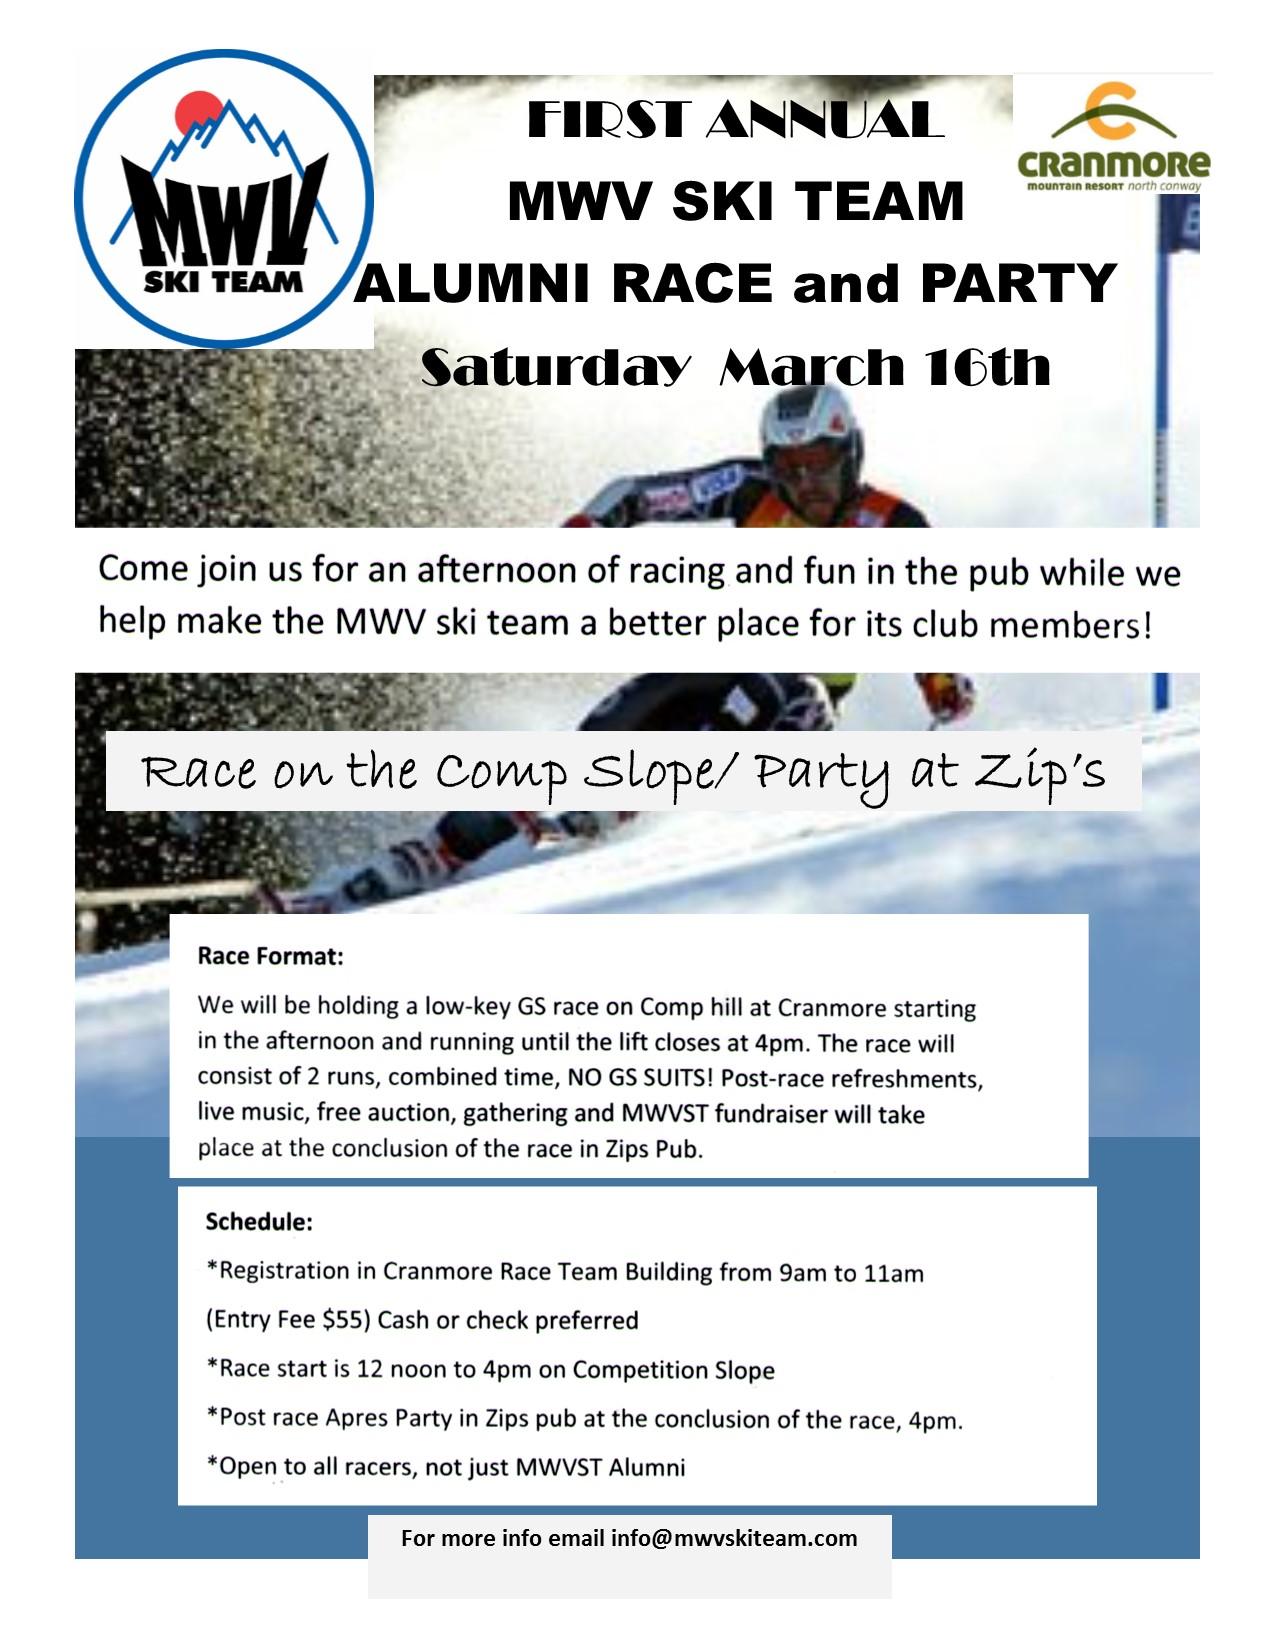 MWVST Alumni Race and Party - MWV Ski Team